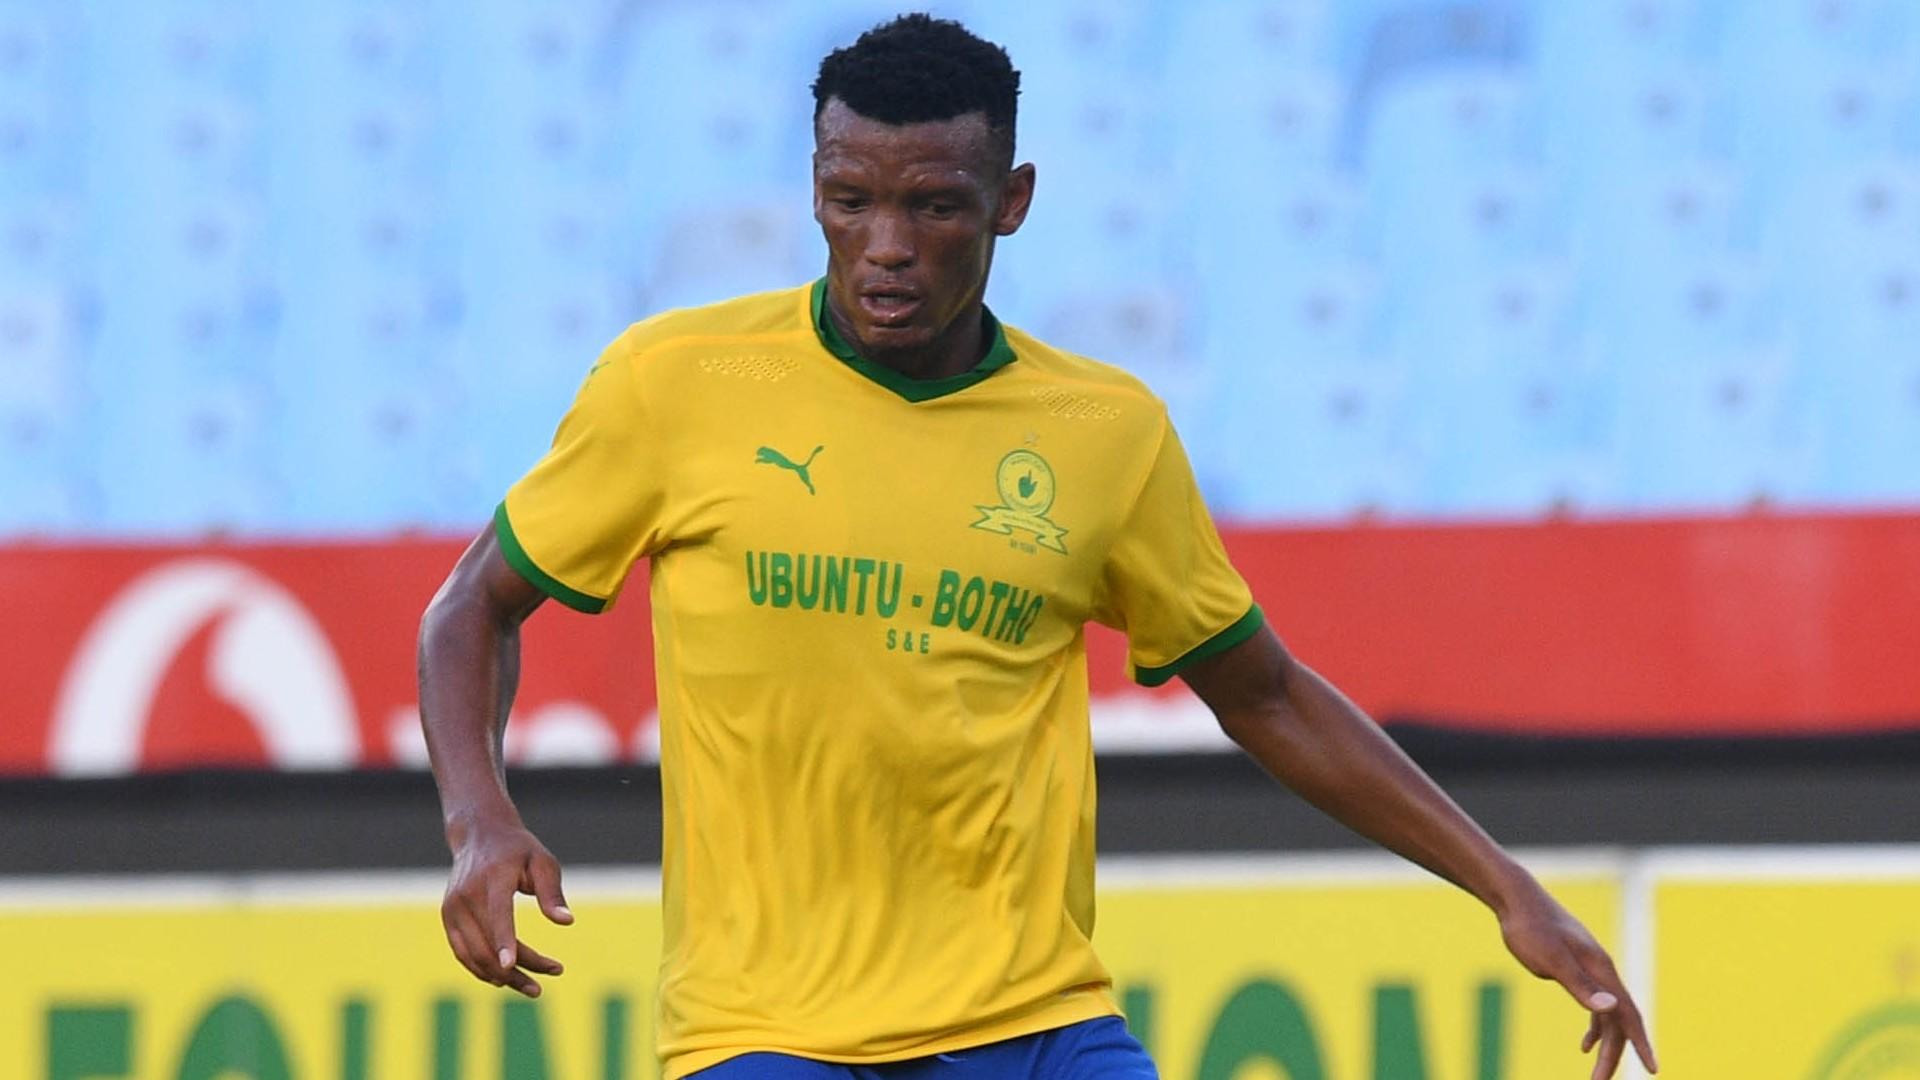 Mamelodi Sundowns' Mngqithi: Mvala had to take one for the team